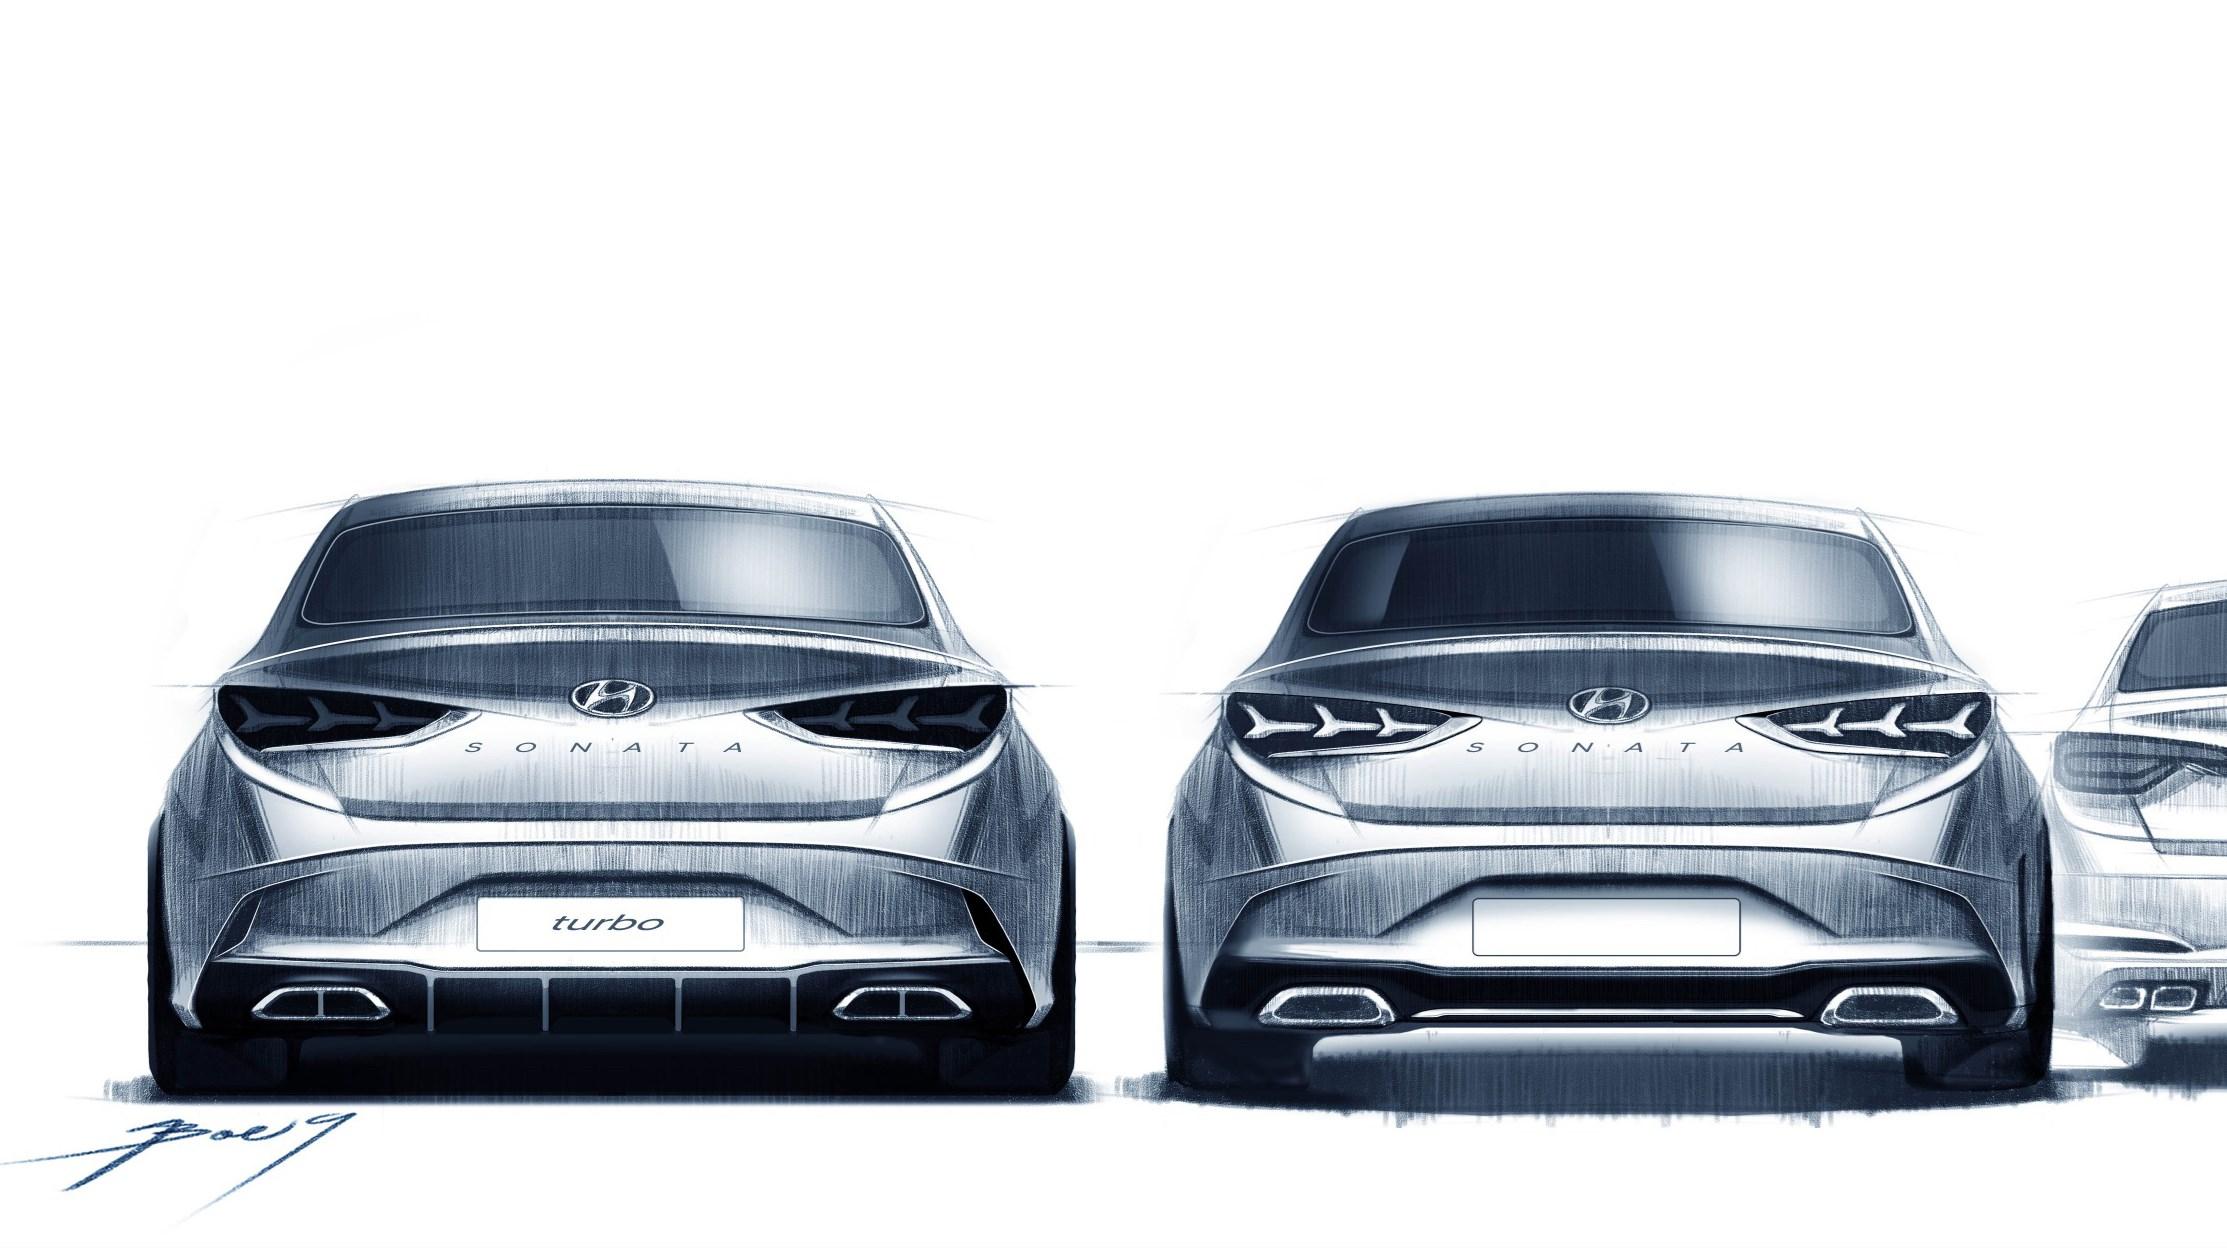 2018 hyundai sonata facelift.  facelift hyundai previews sporty new sonata update  inside 2018 hyundai sonata facelift